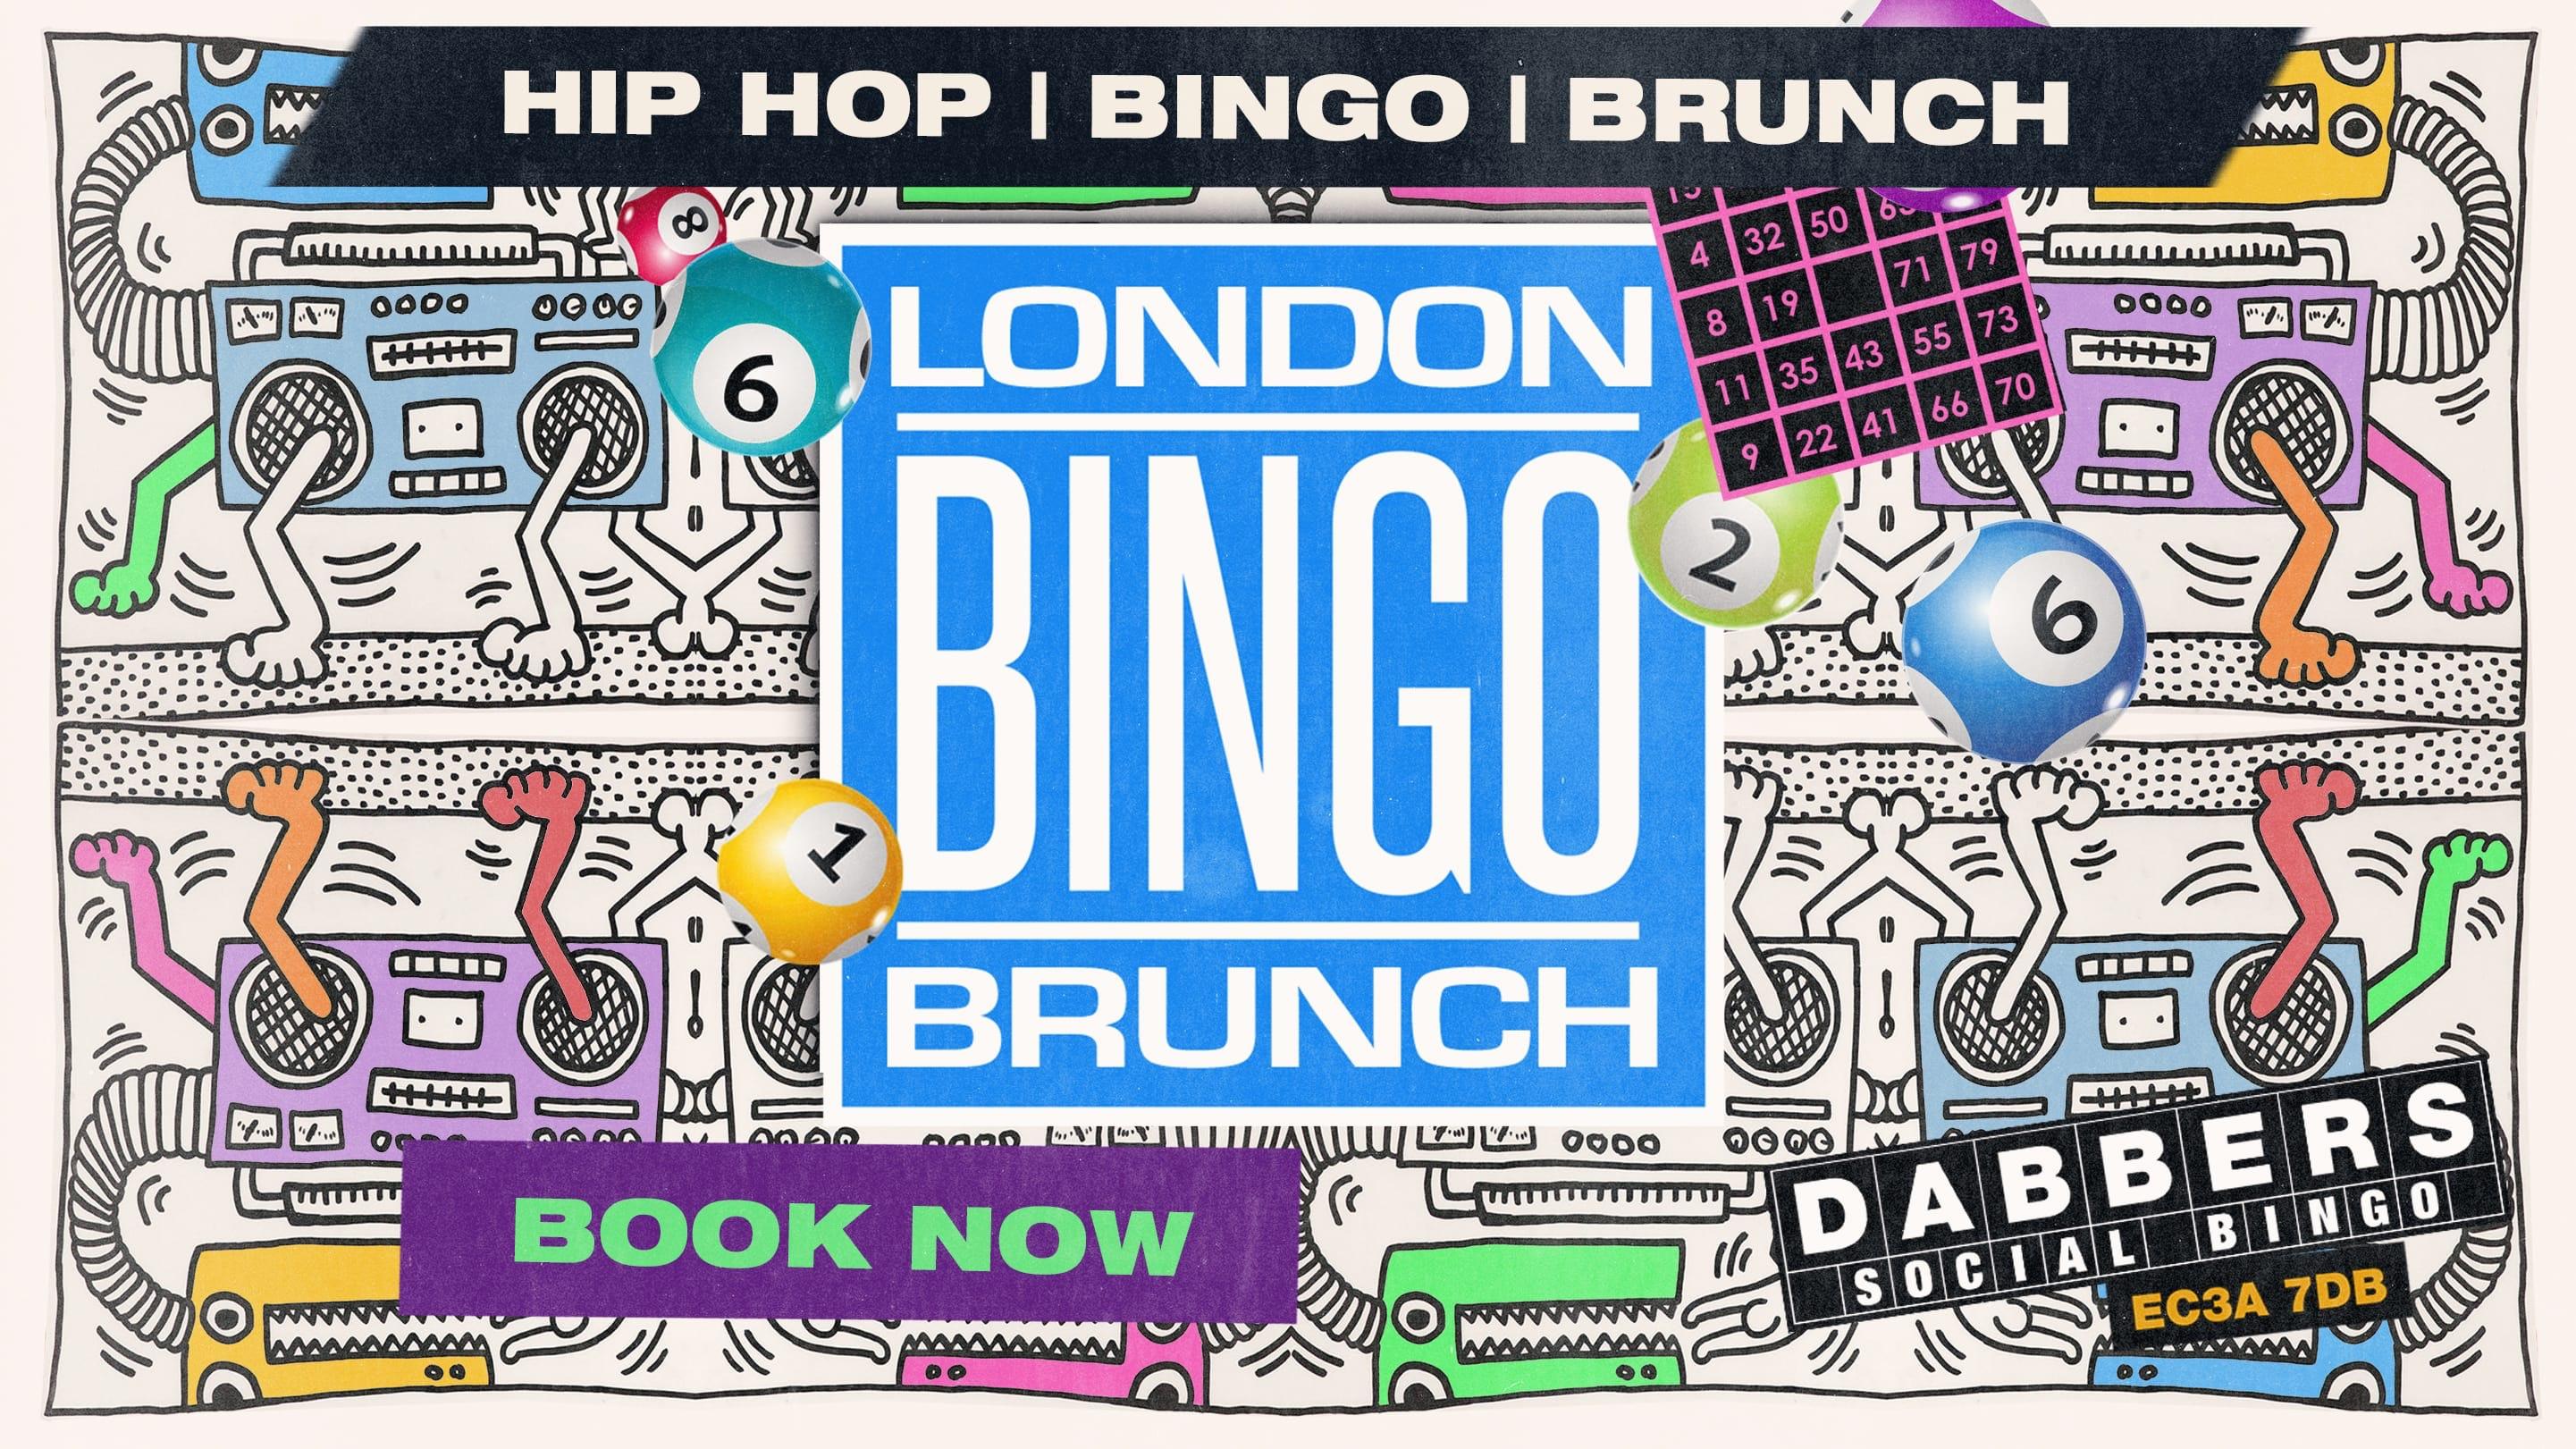 London Bingo Brunch: Hip Hop Hits Only!